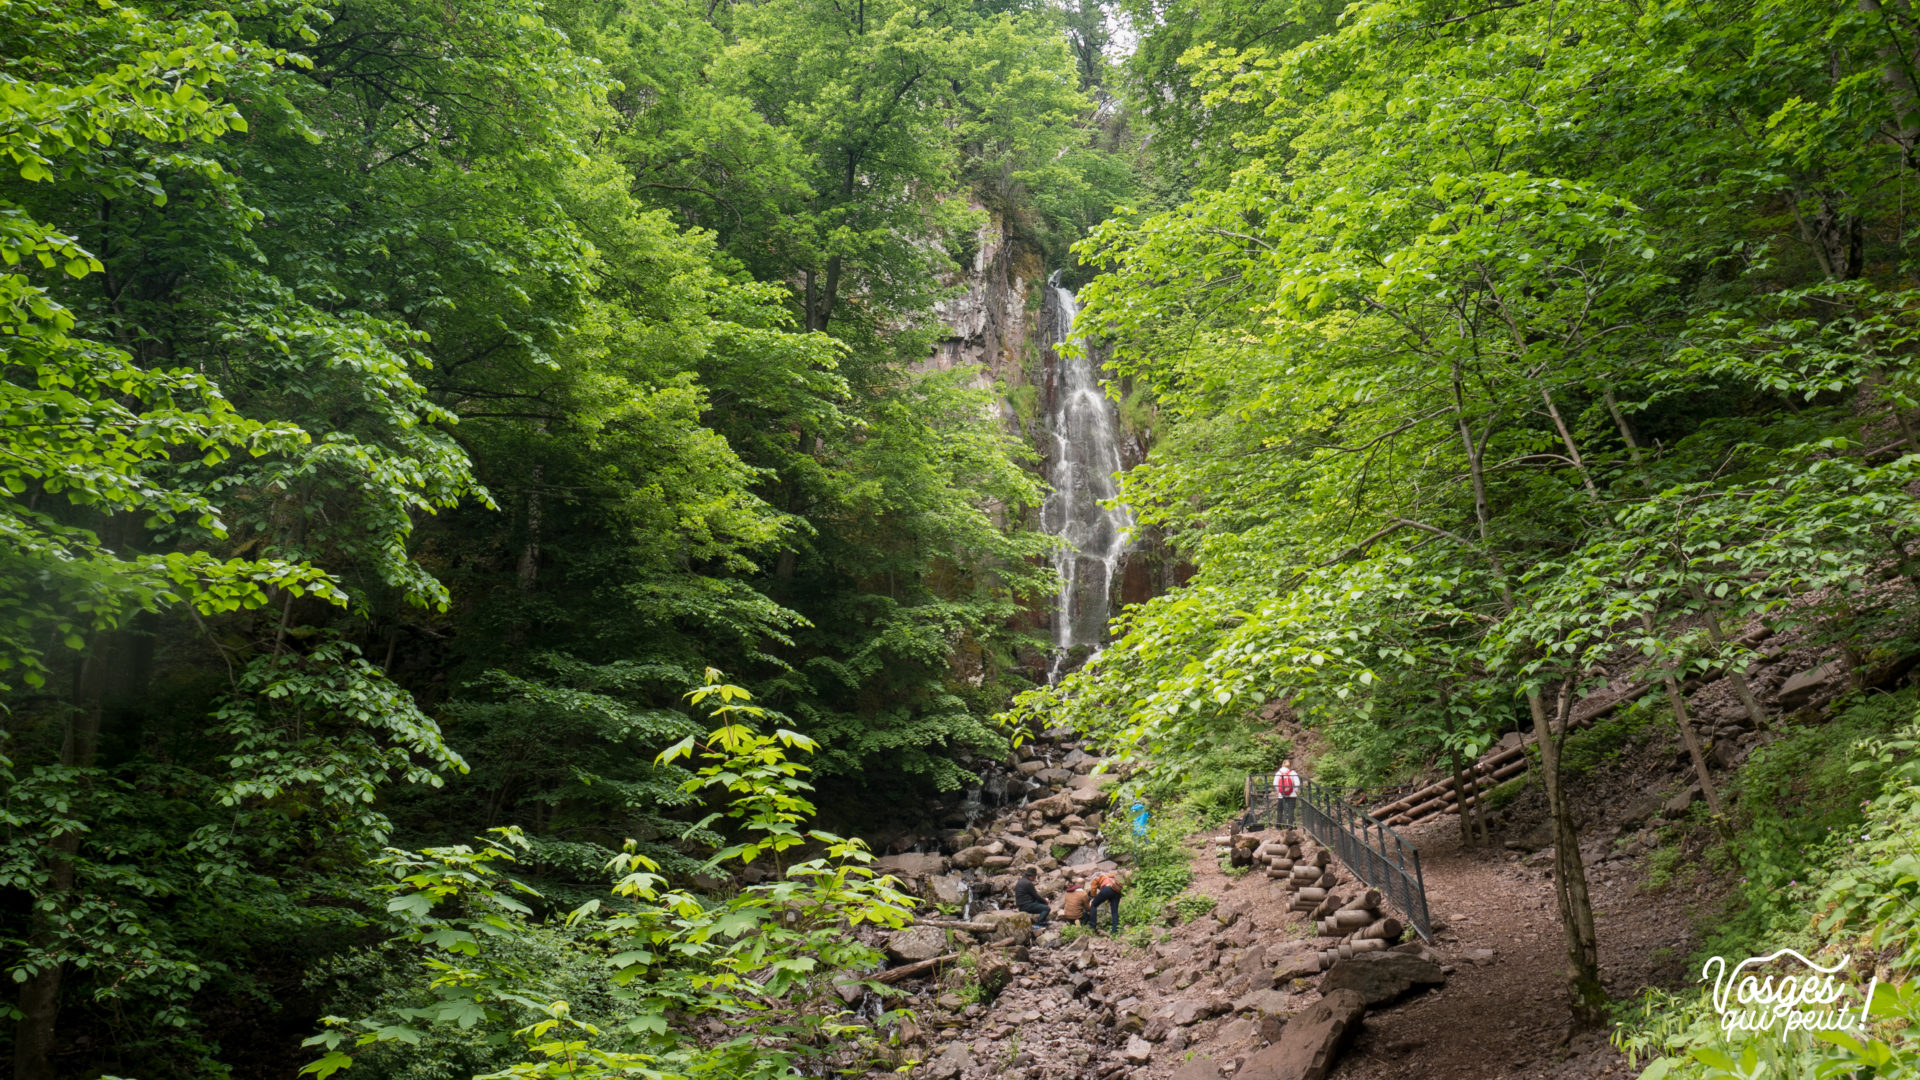 Cascade du Nideck en pleine forêt des Vosges en Alsace